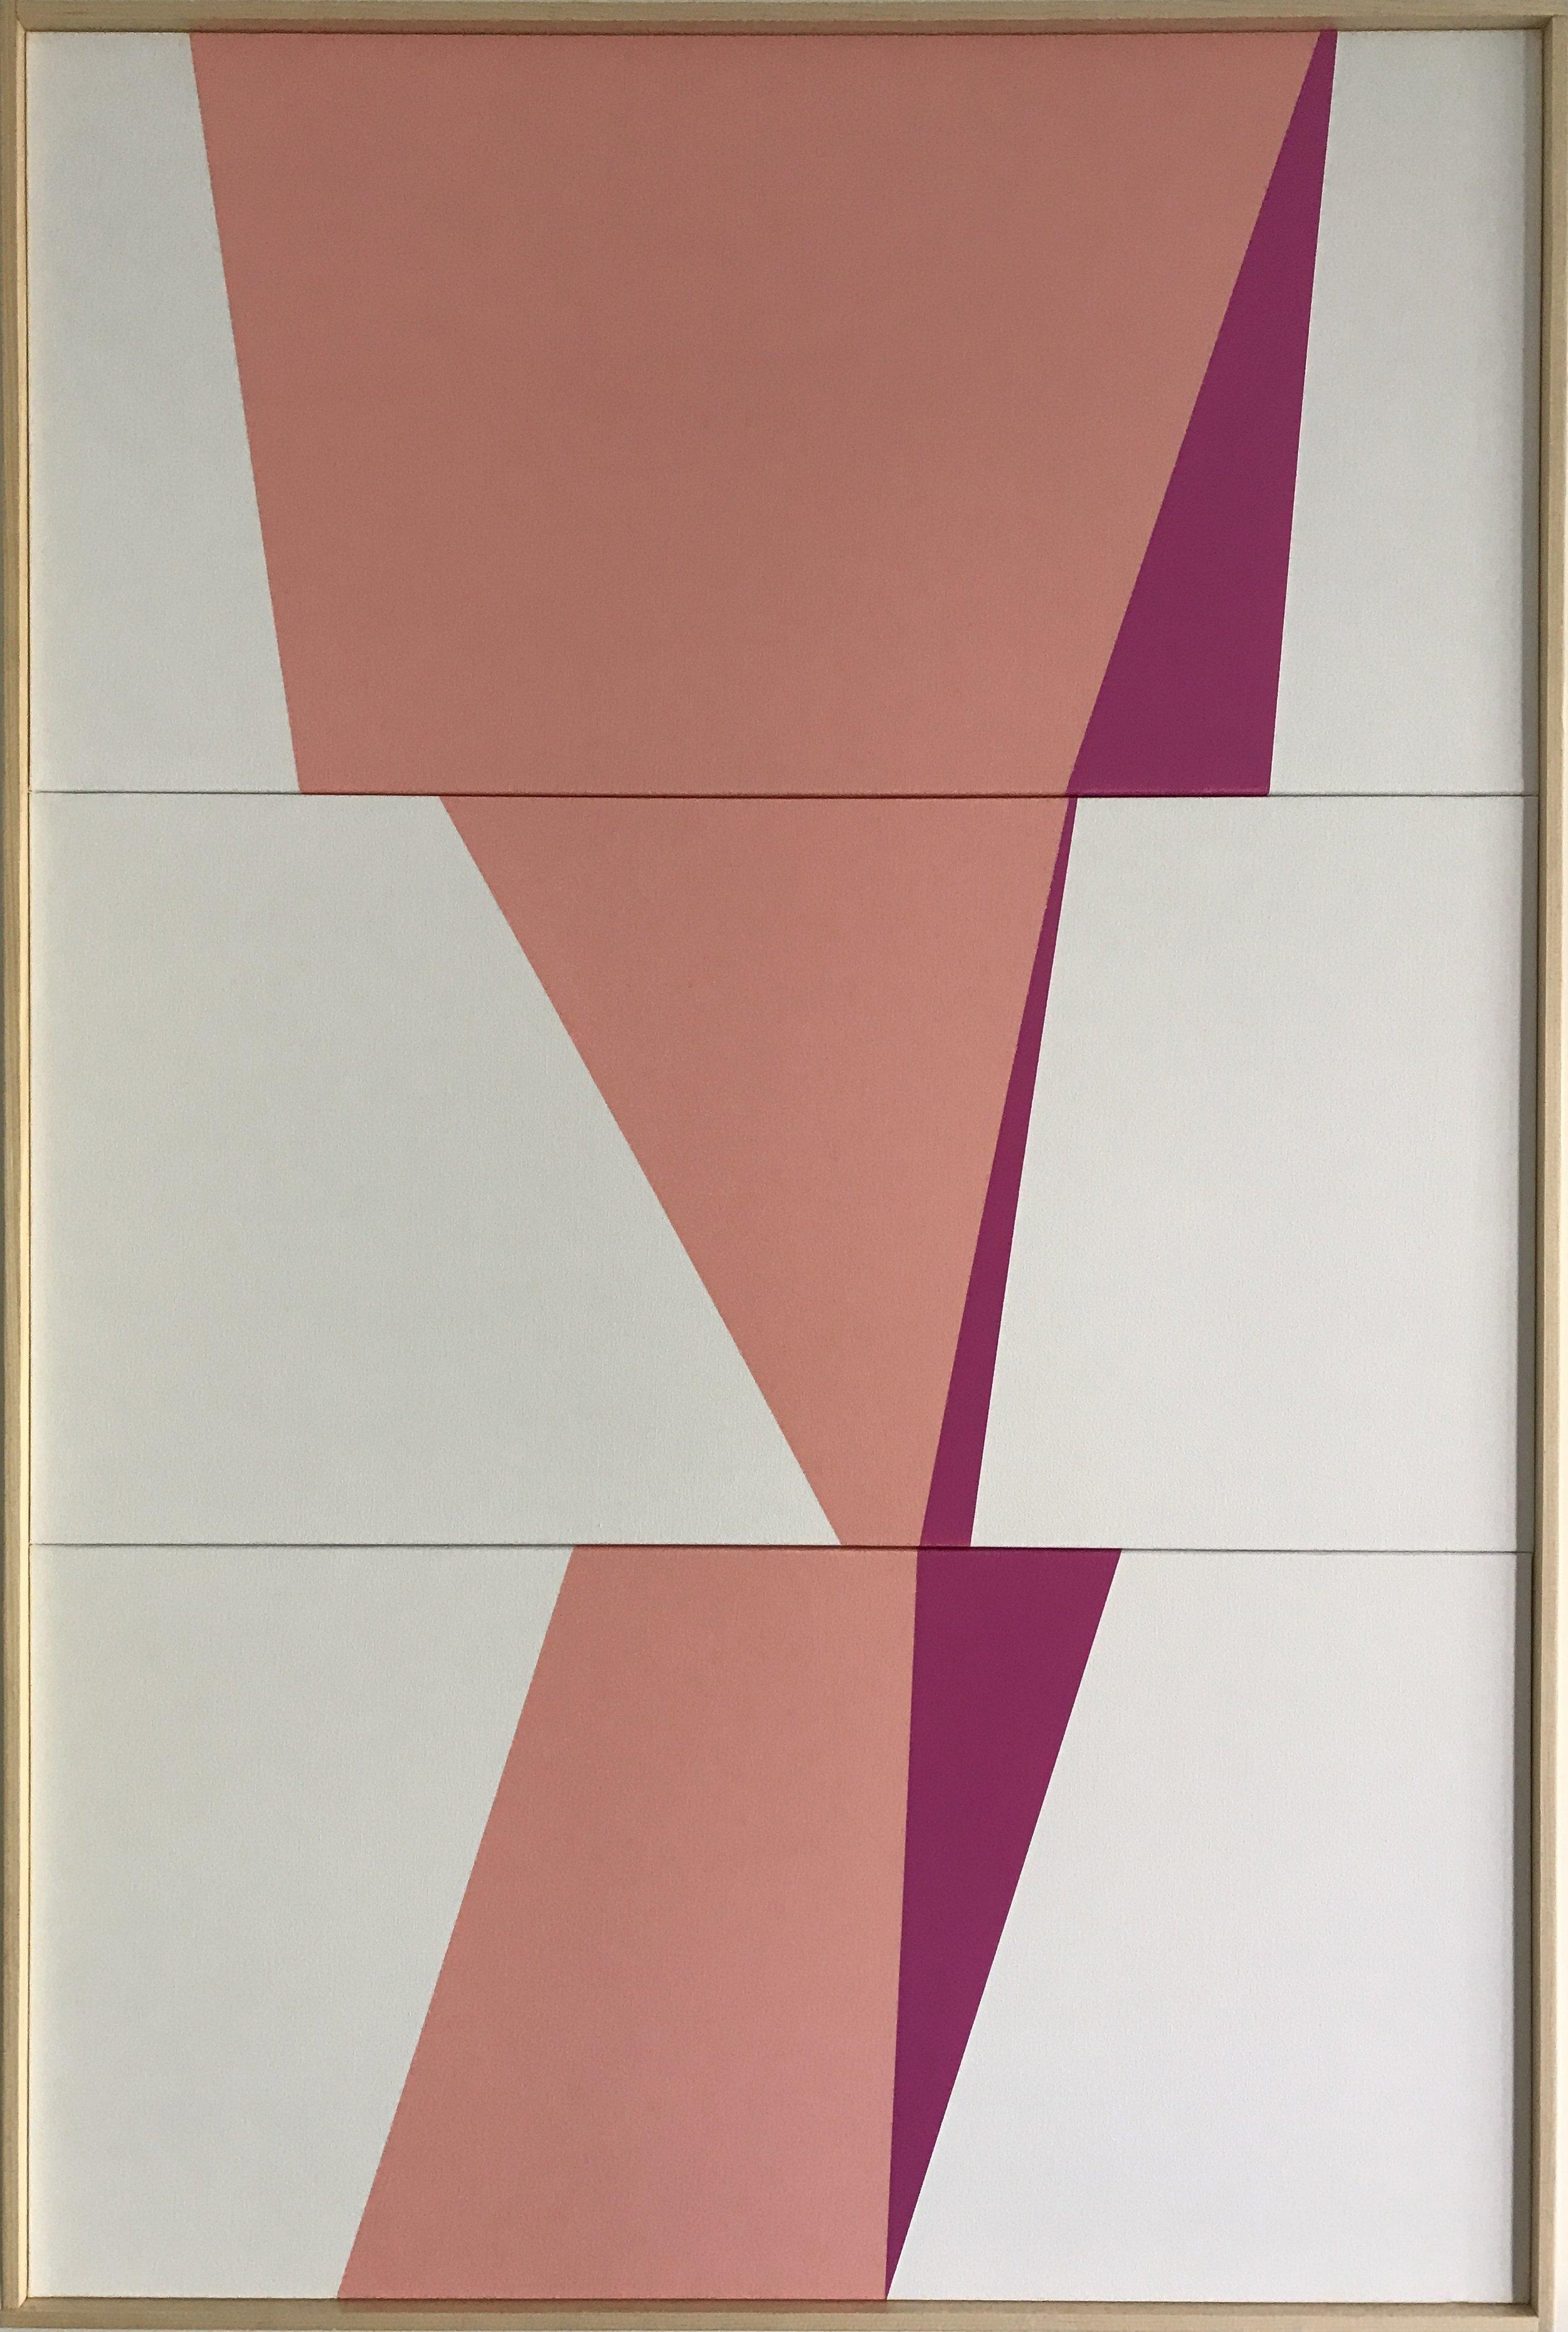 Pink Formation Triptych JET0520 - Image 1.JPG